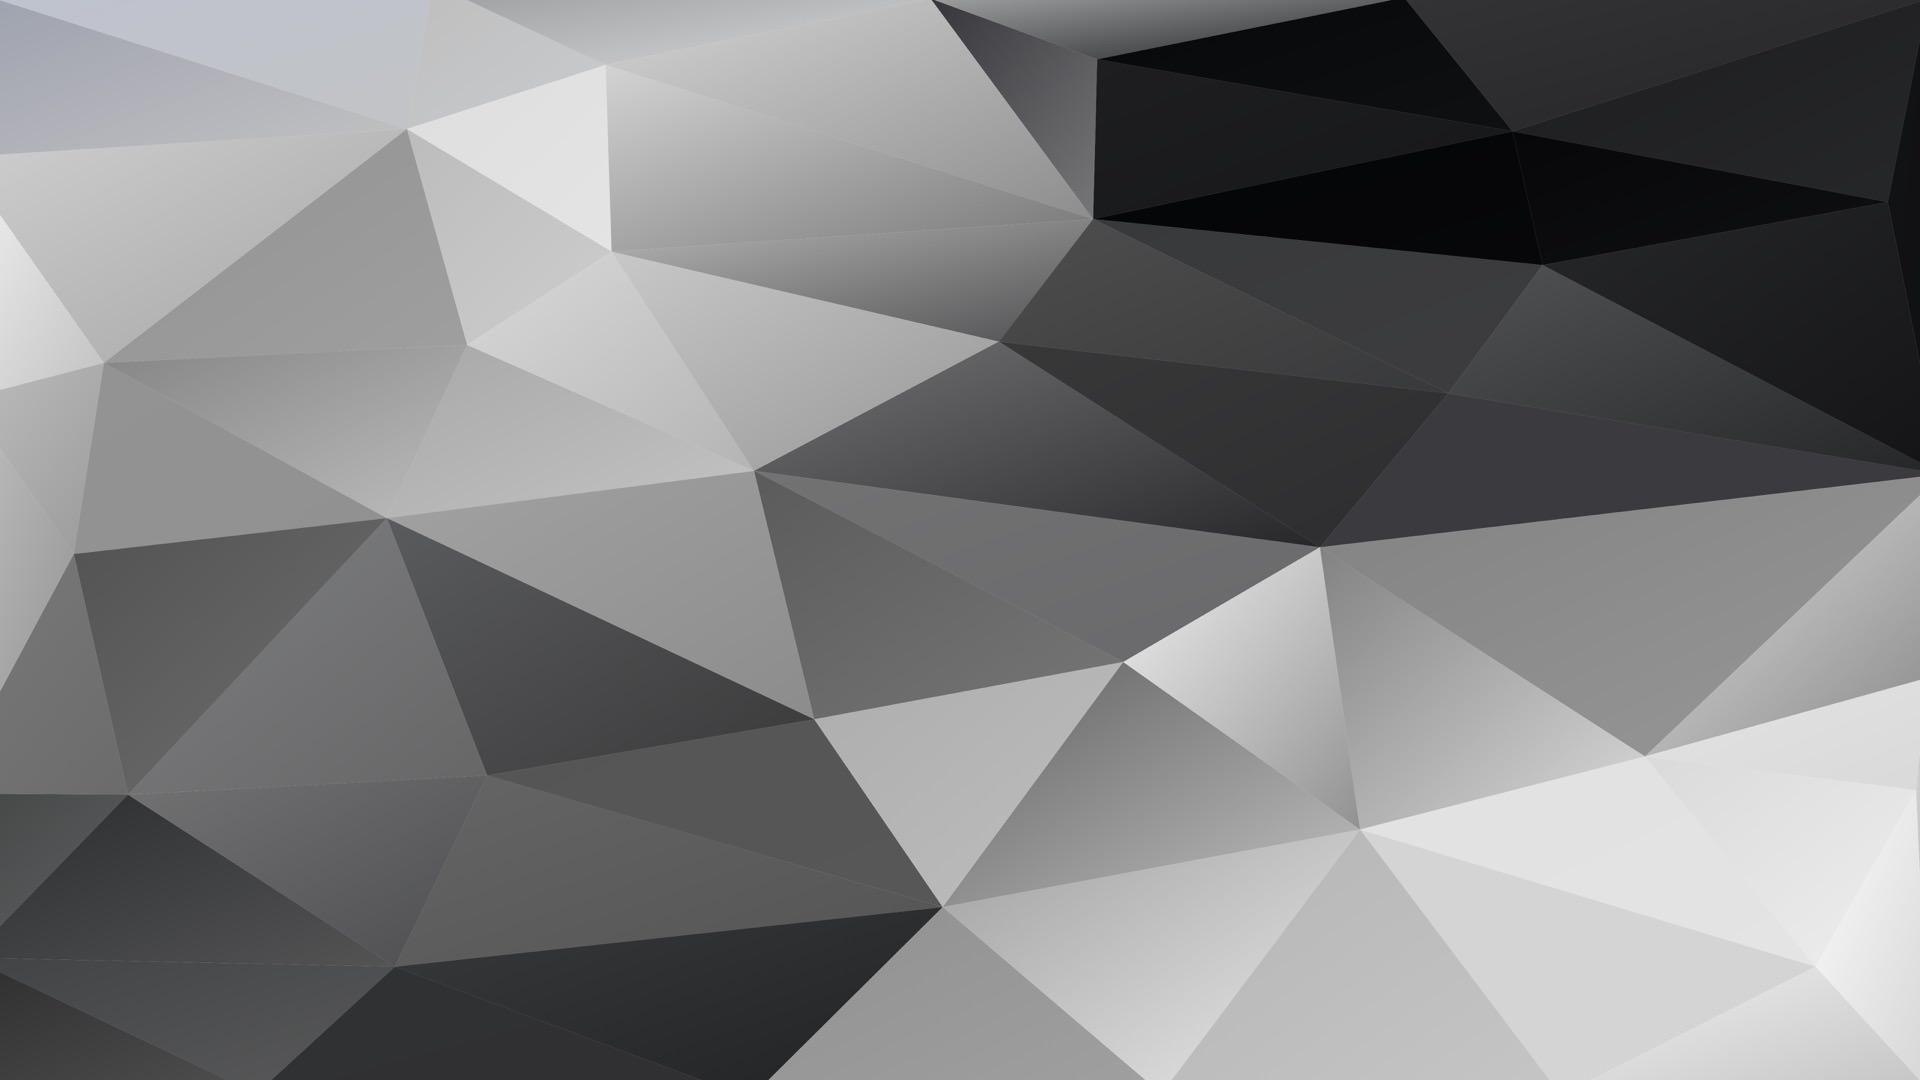 Download 650+ Background Tumblr Hitam Putih Gratis